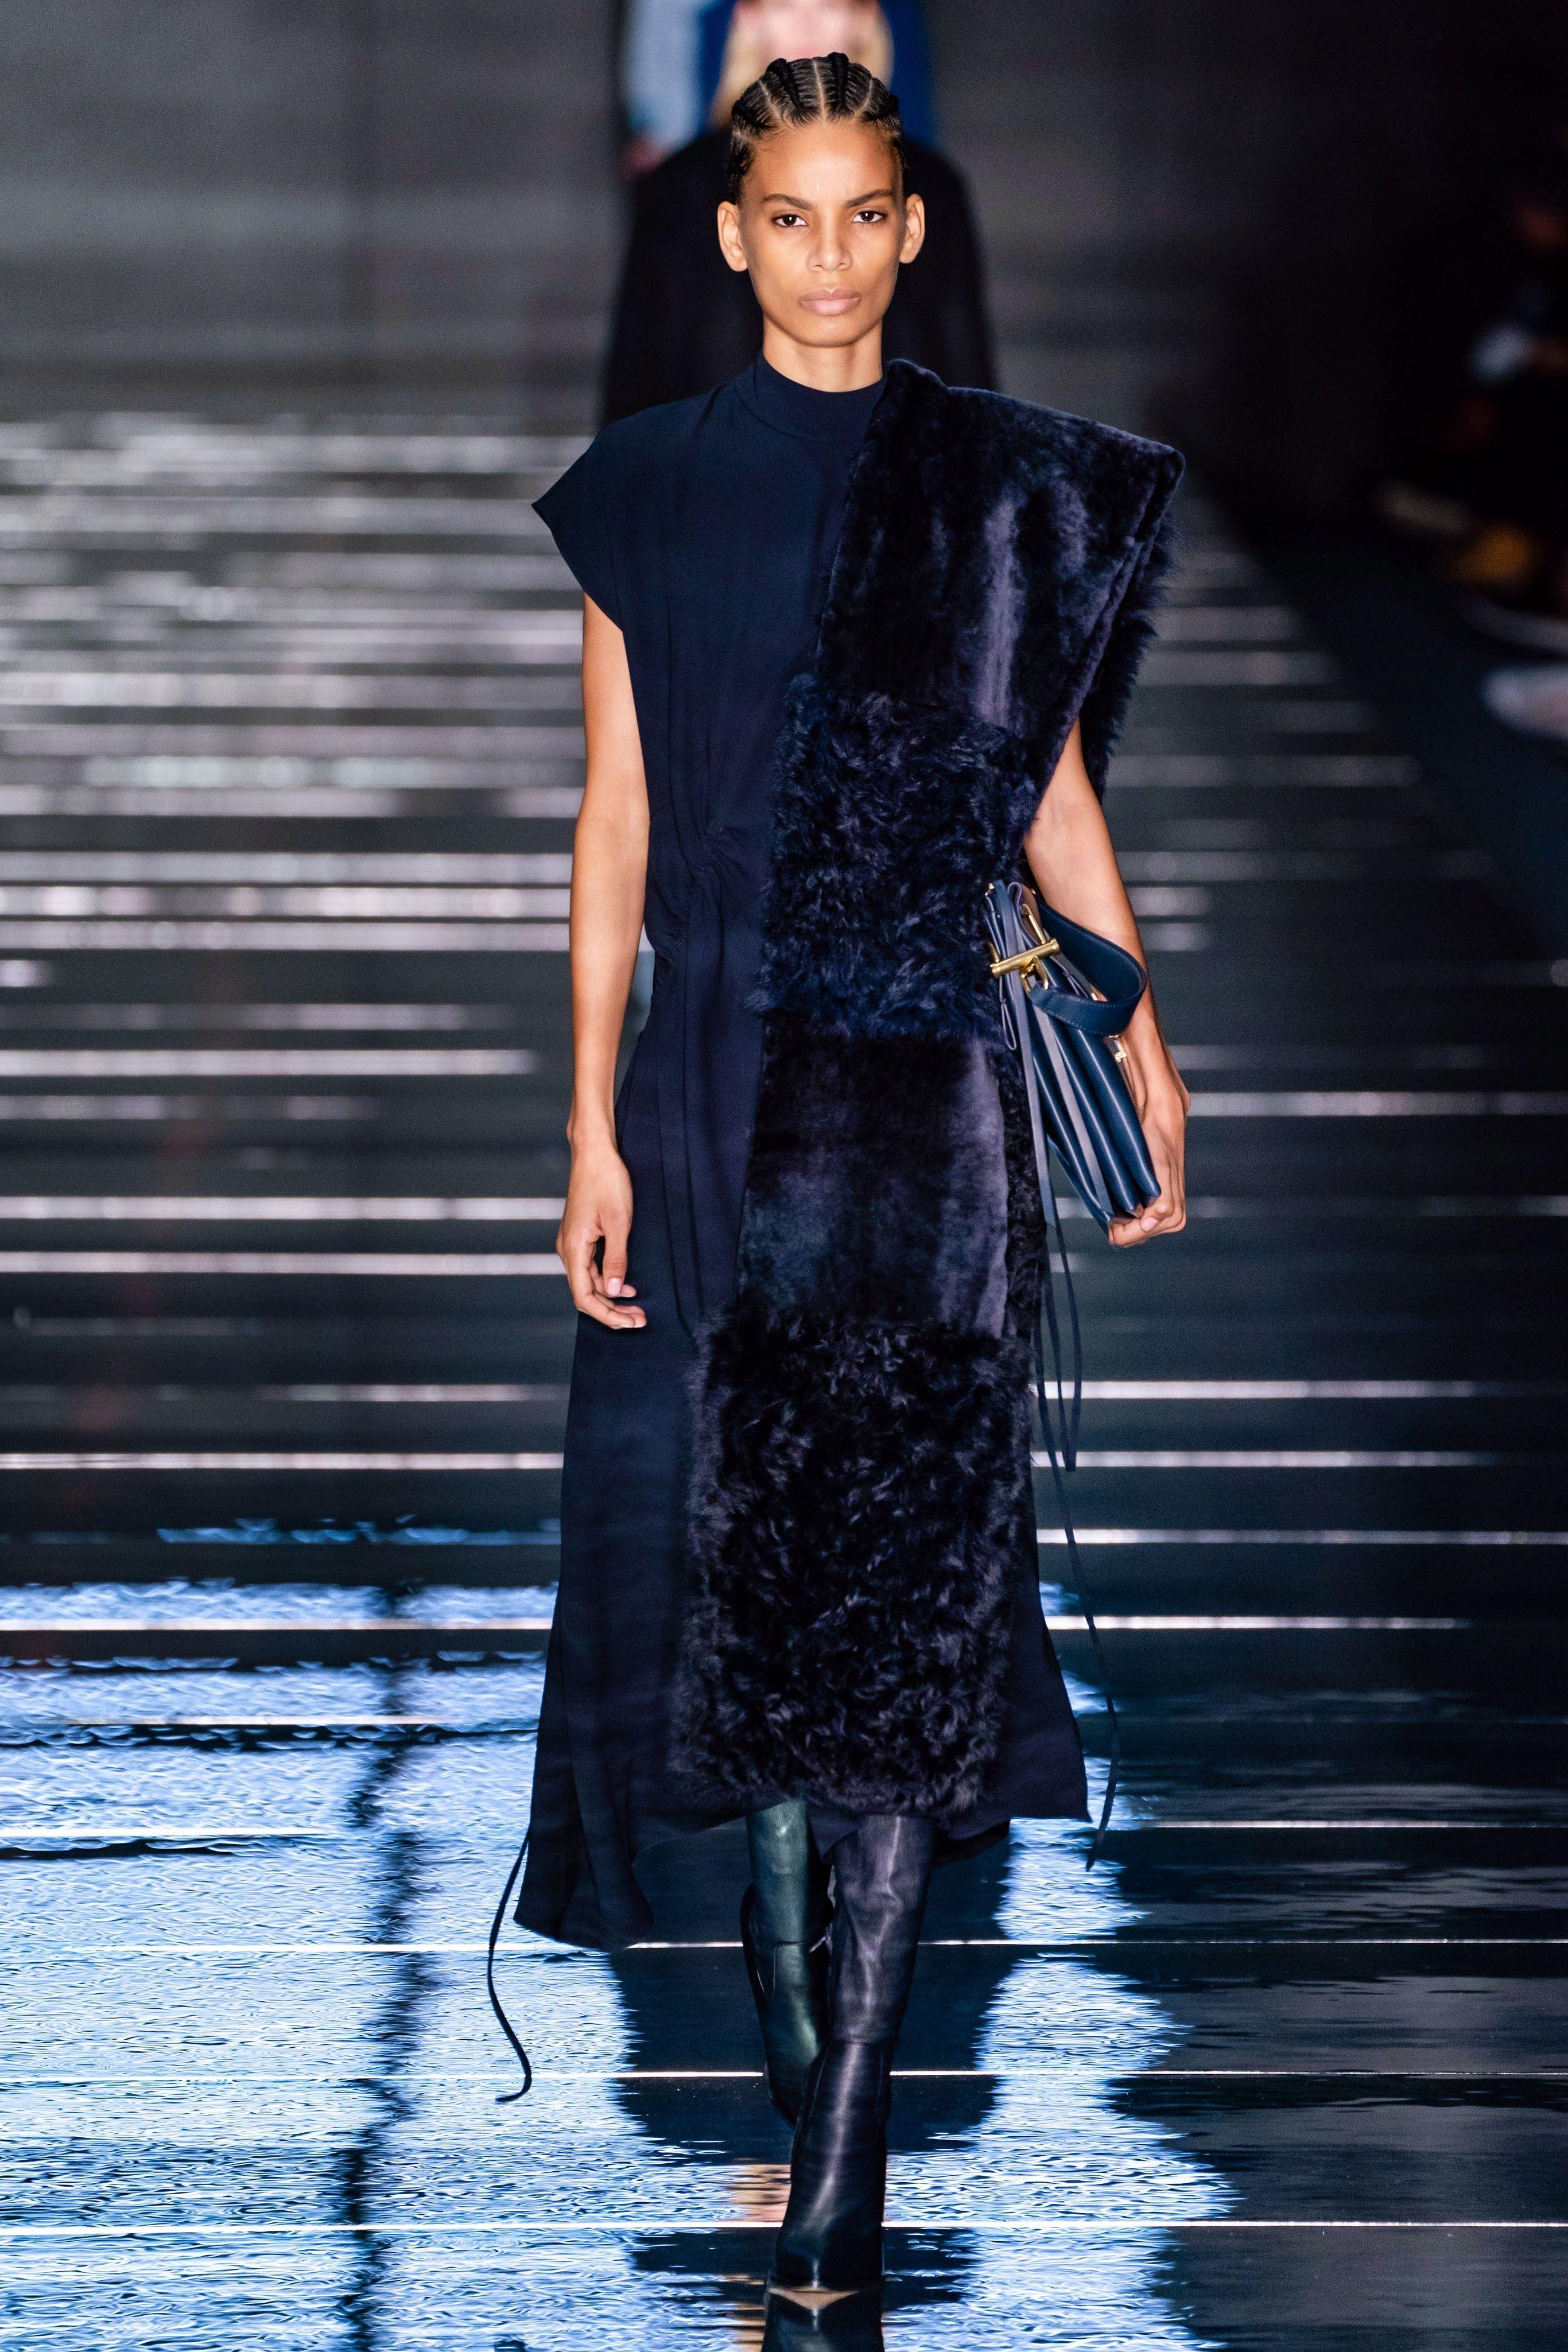 d2d04266924 Boss Fall 2019 Ready-to-Wear Fashion Show in 2019 | Women's fashion ...